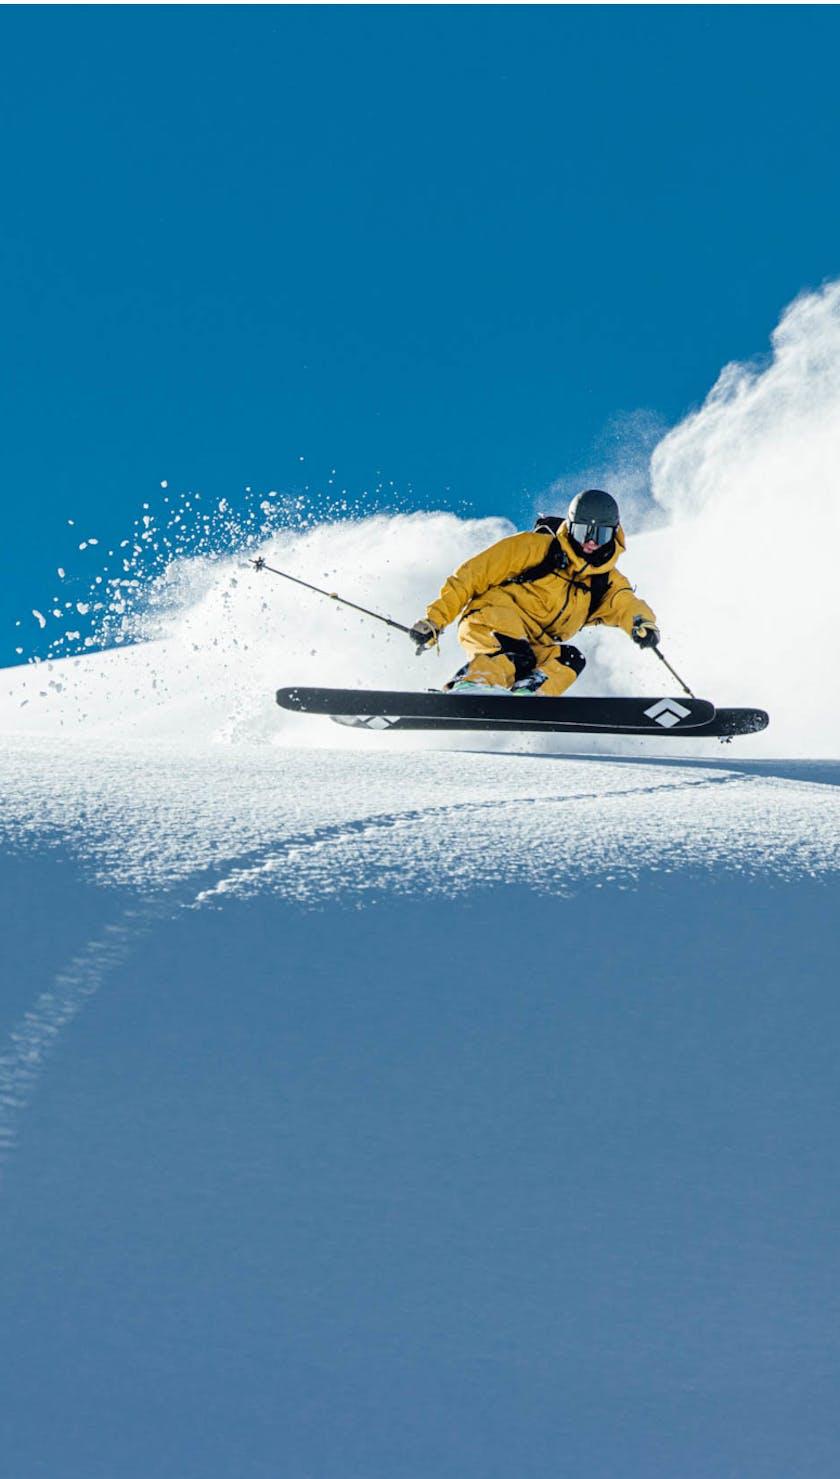 Black Diamond Athlete Parkin Costain skiing the Impulse 104 skis.